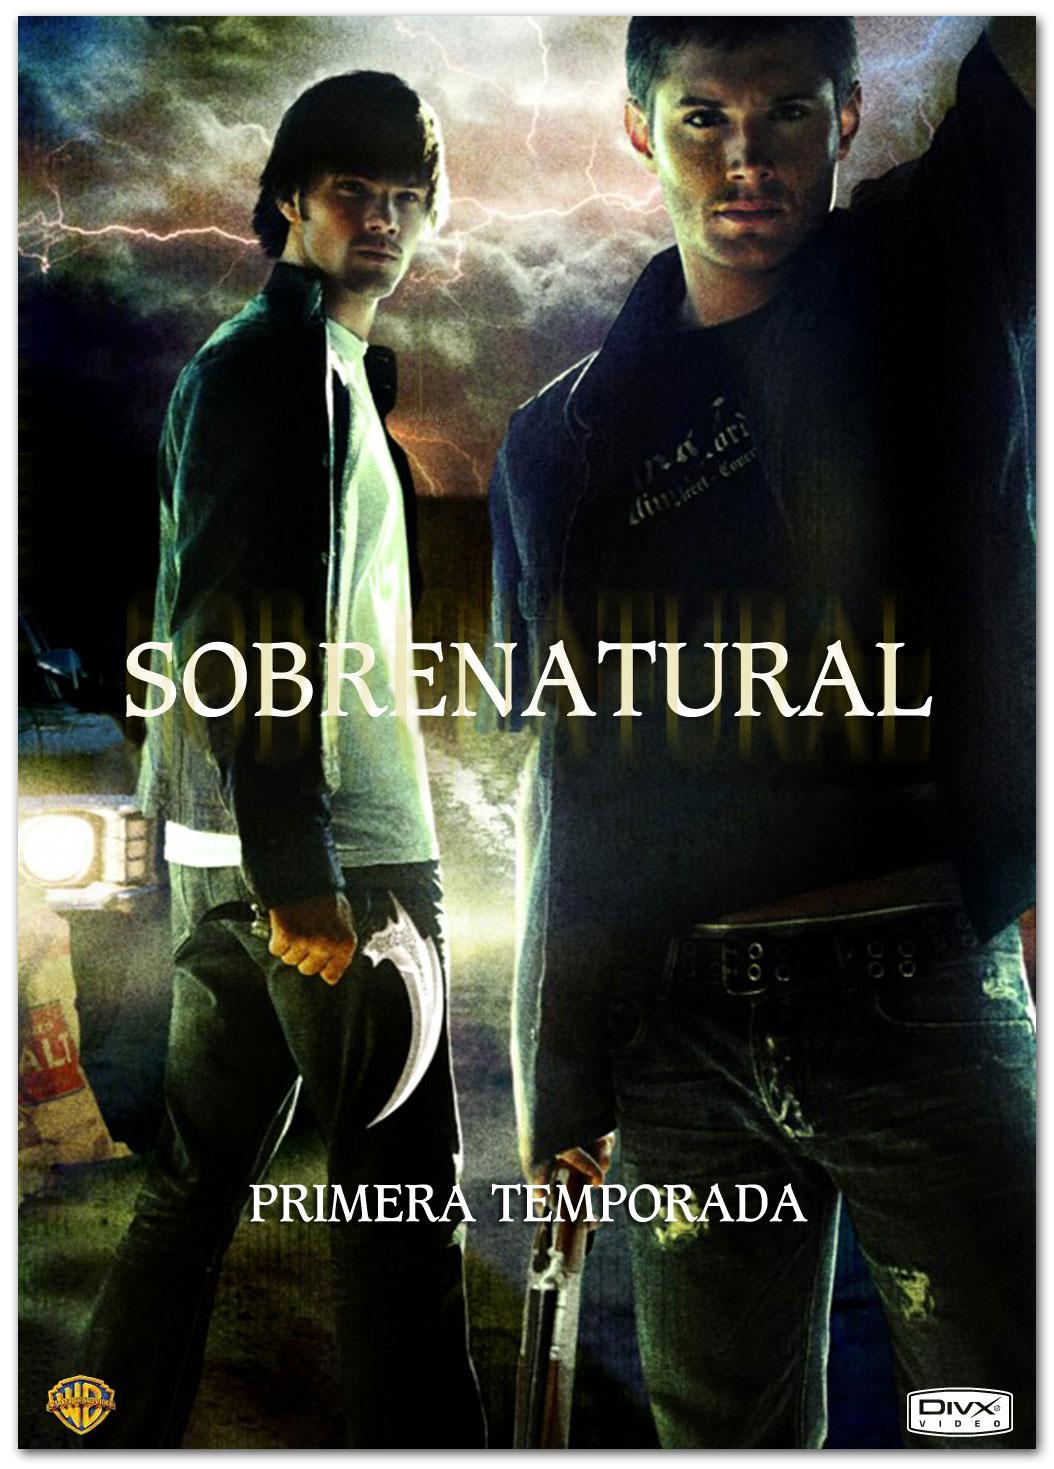 Sobrenatural - Primera temporada